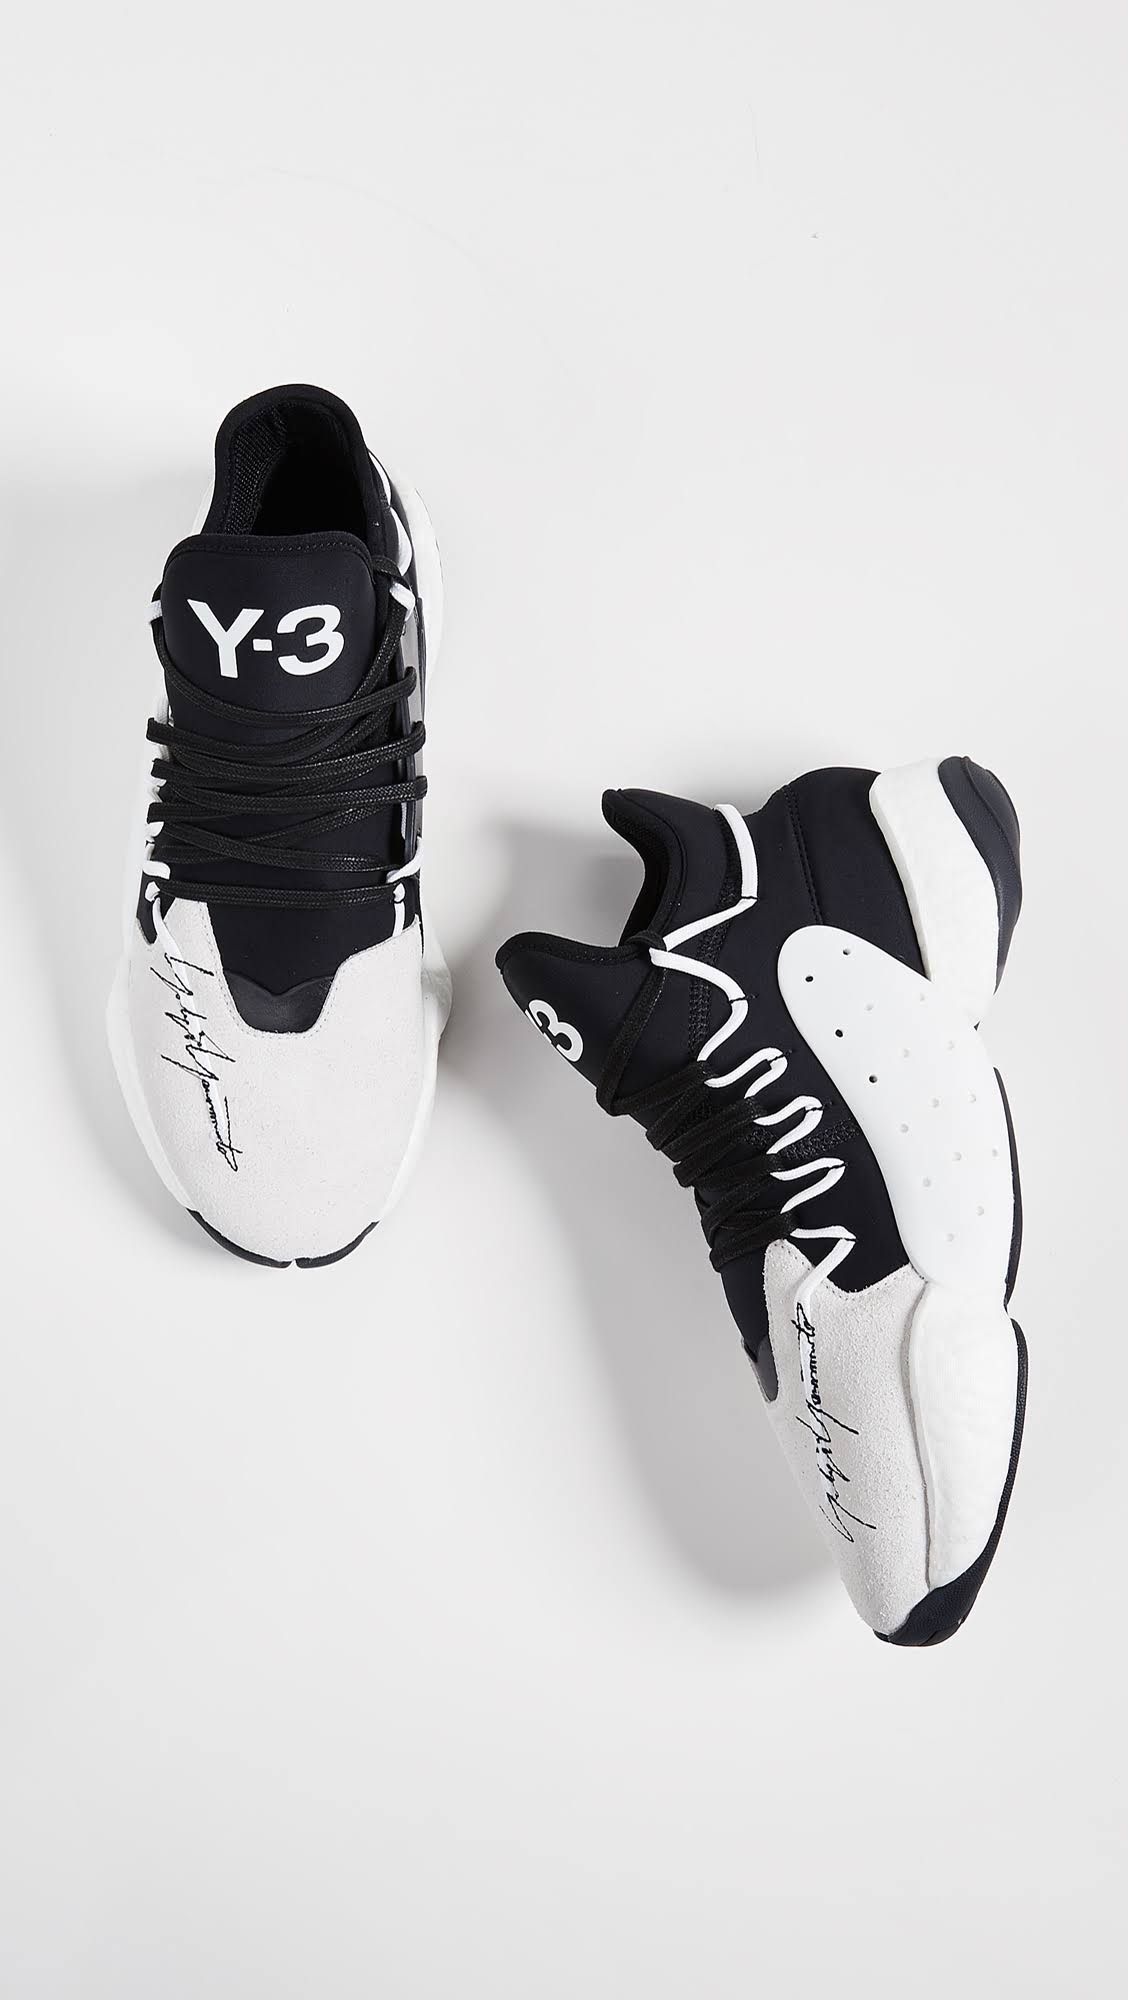 7 Hombre Byw Bball Y Zapatillas M Adidas Para Blancas Negras Uk 3 tzqYq